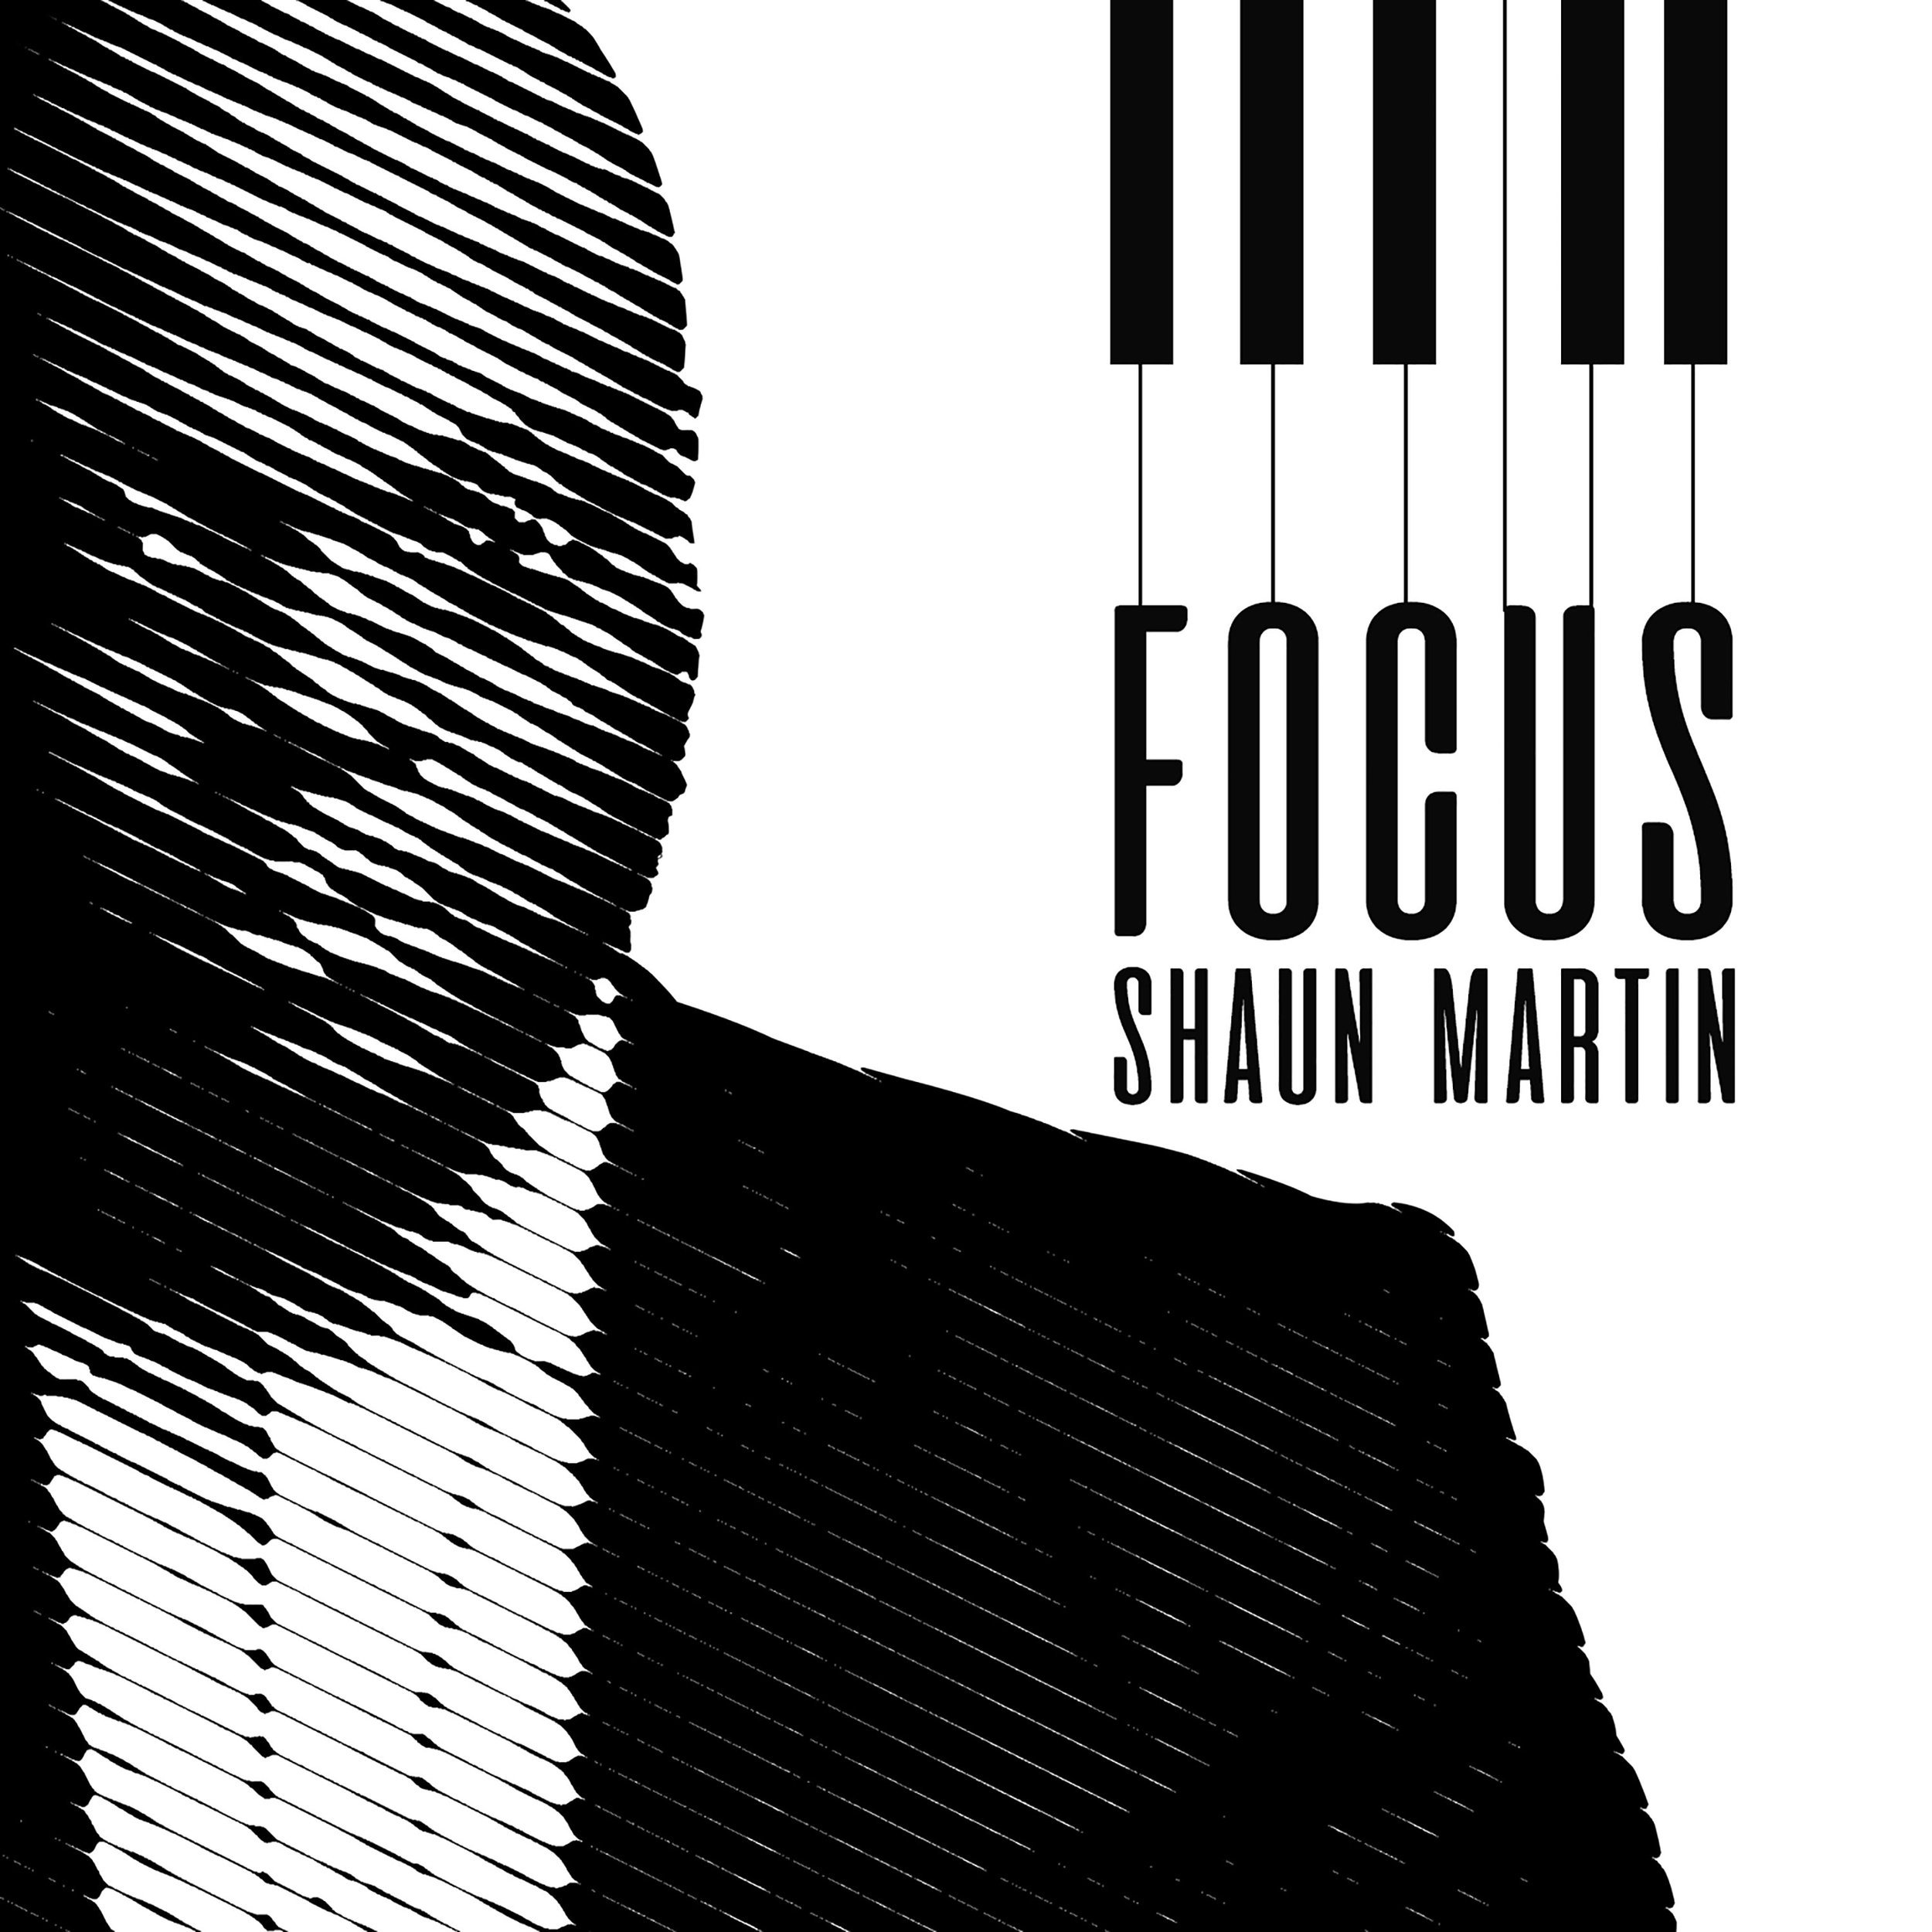 SMarin_FOCUS_cover-upload.jpg